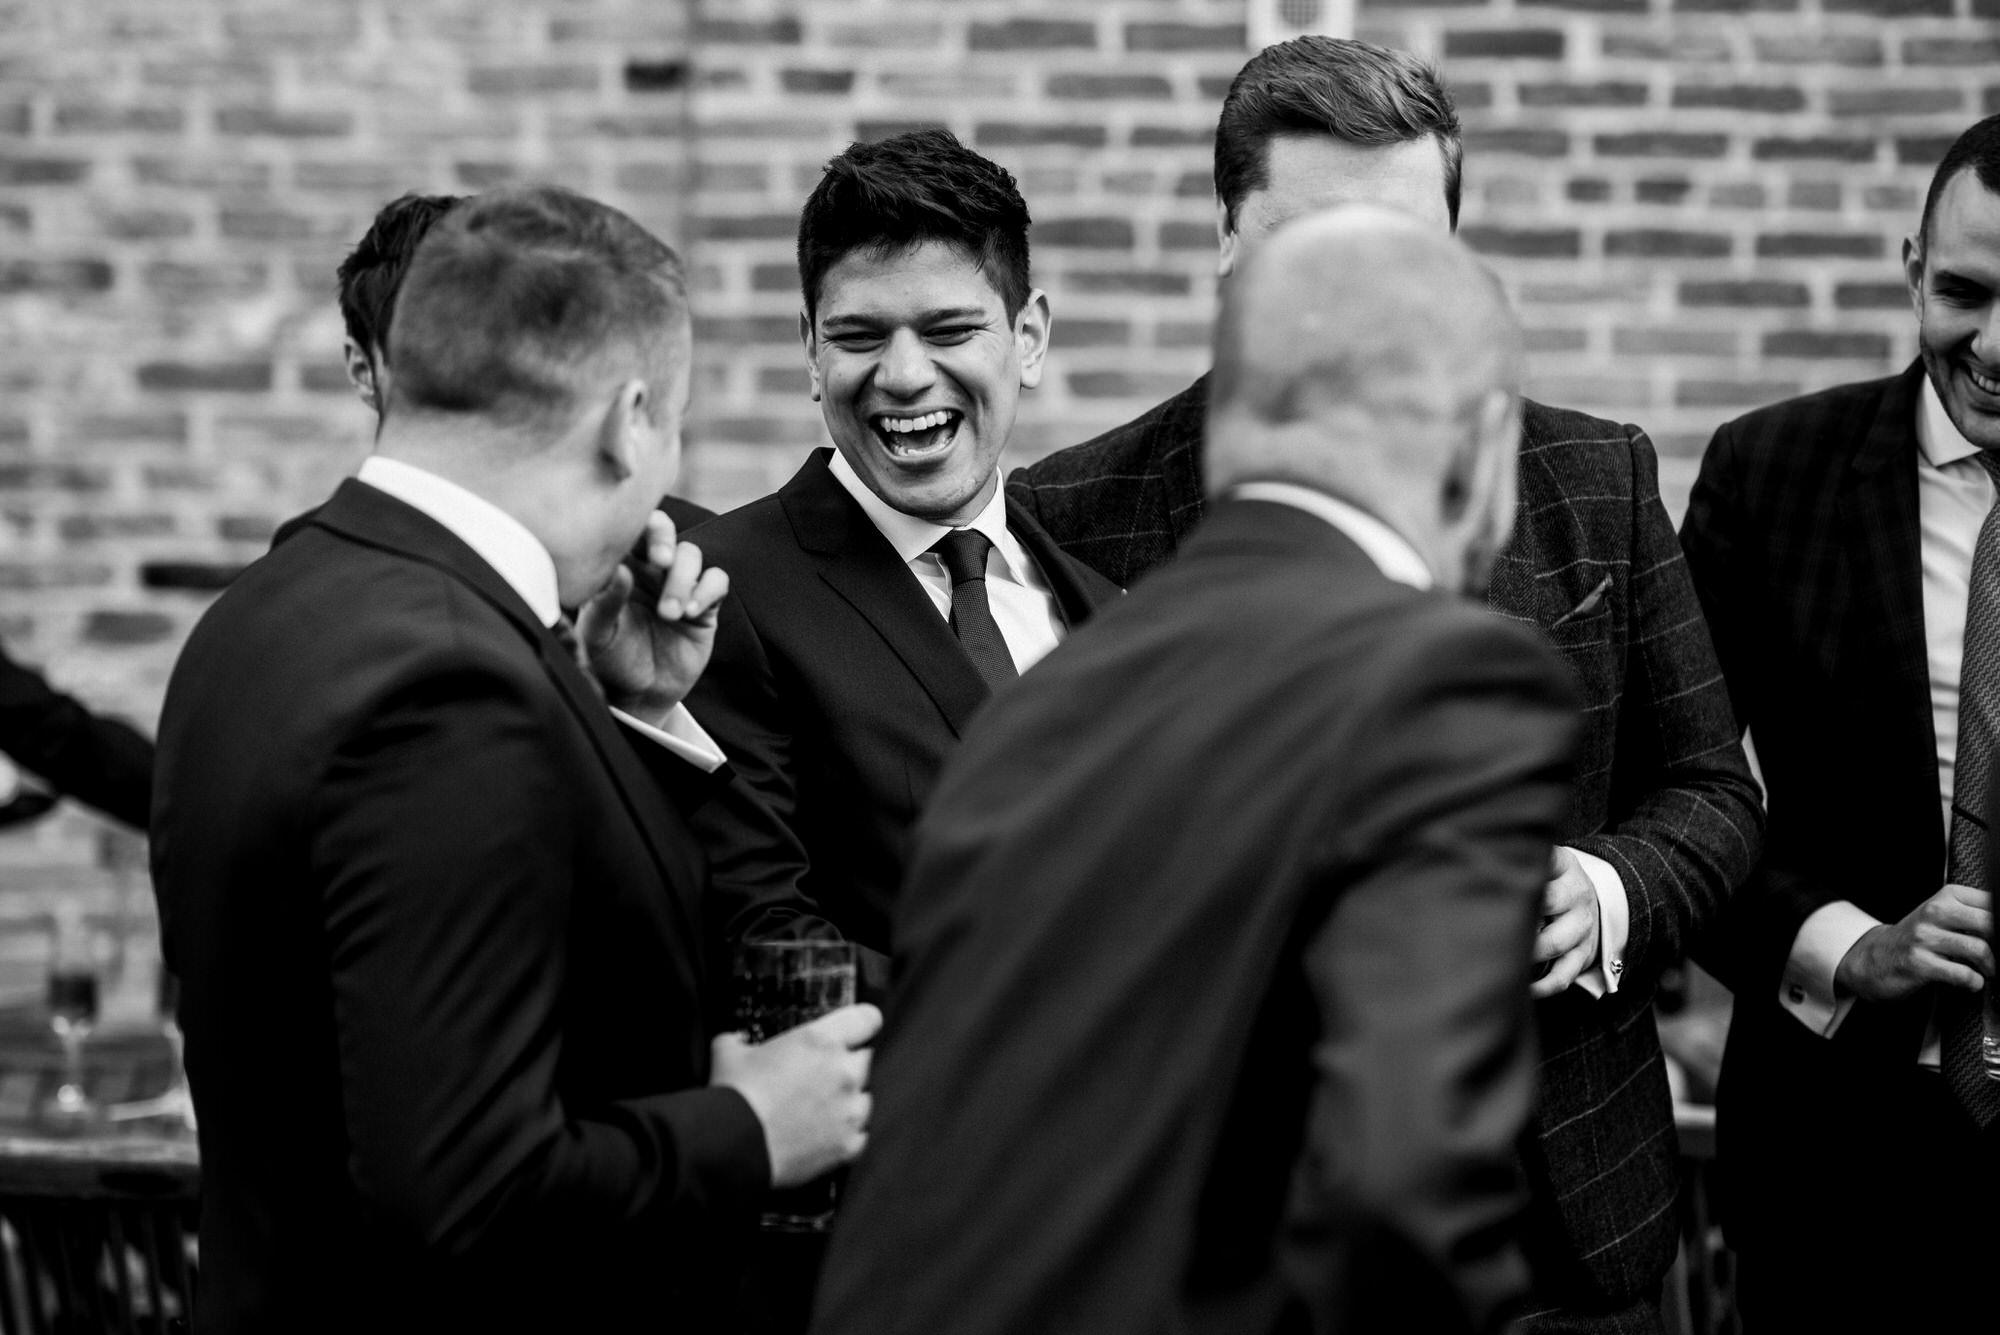 Merrydale manor wedding photography 067